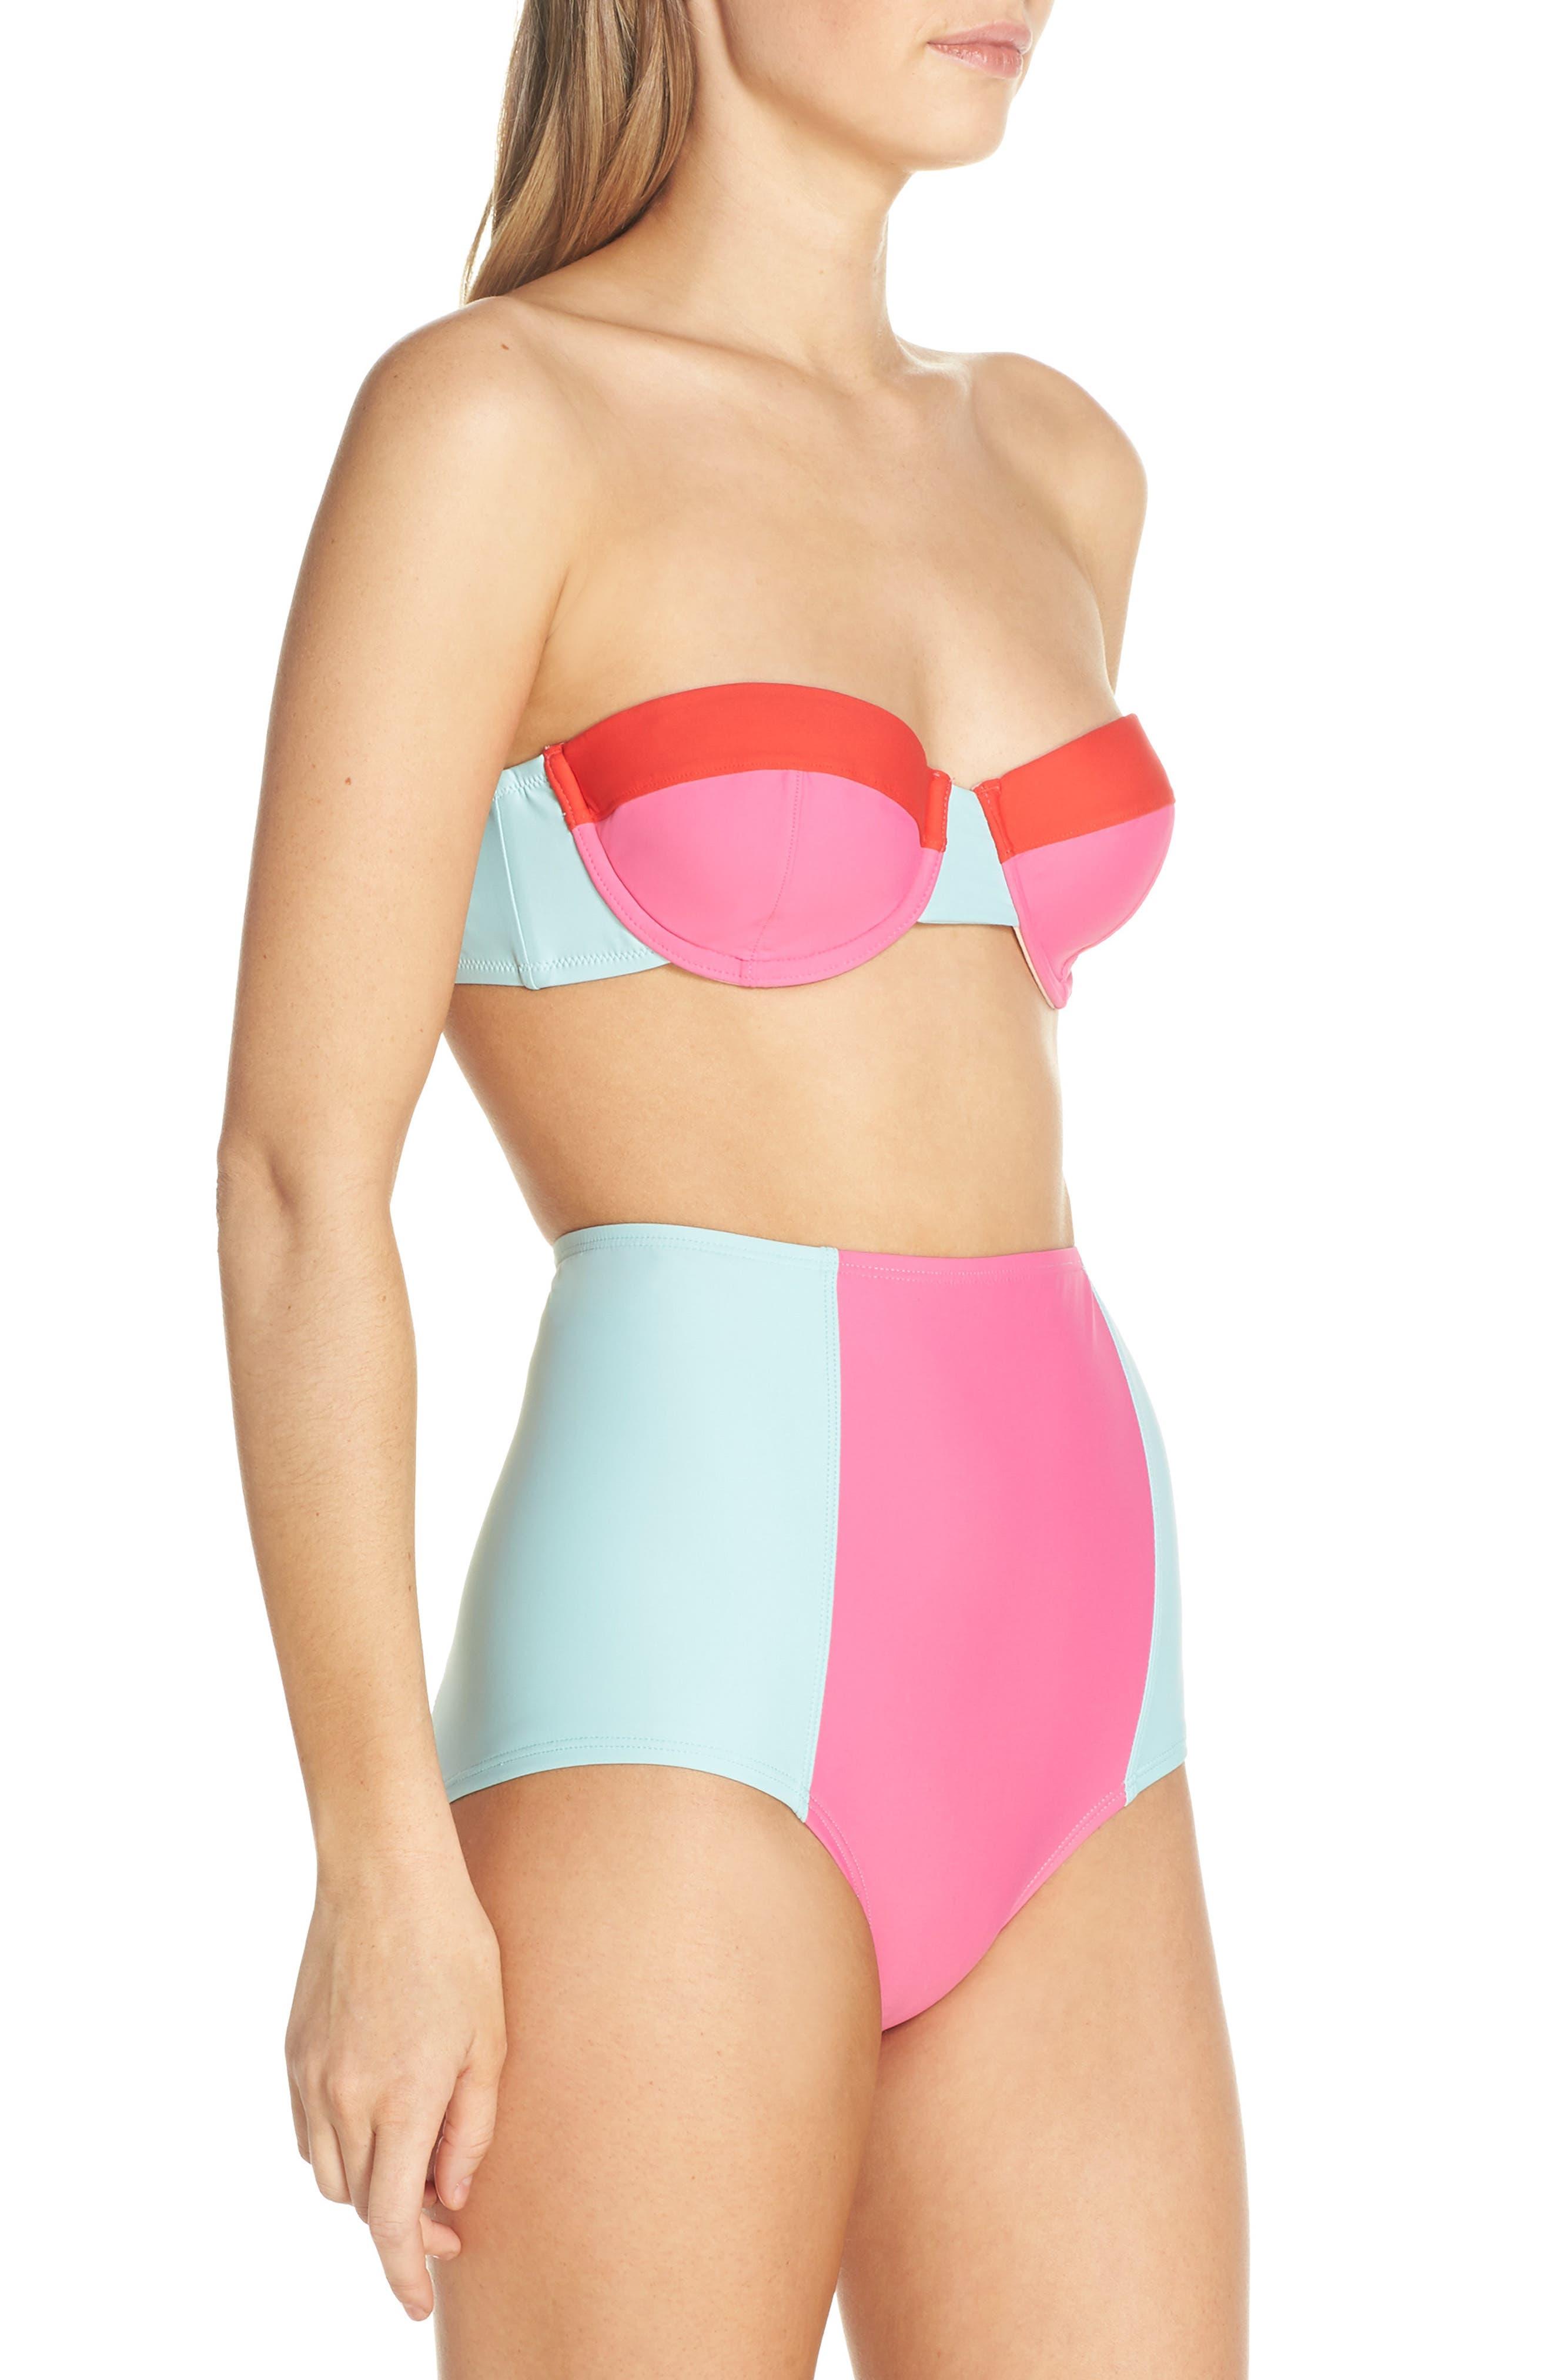 Colorblock Underwire Bikini Top,                             Alternate thumbnail 10, color,                             MINT CERISE PINK